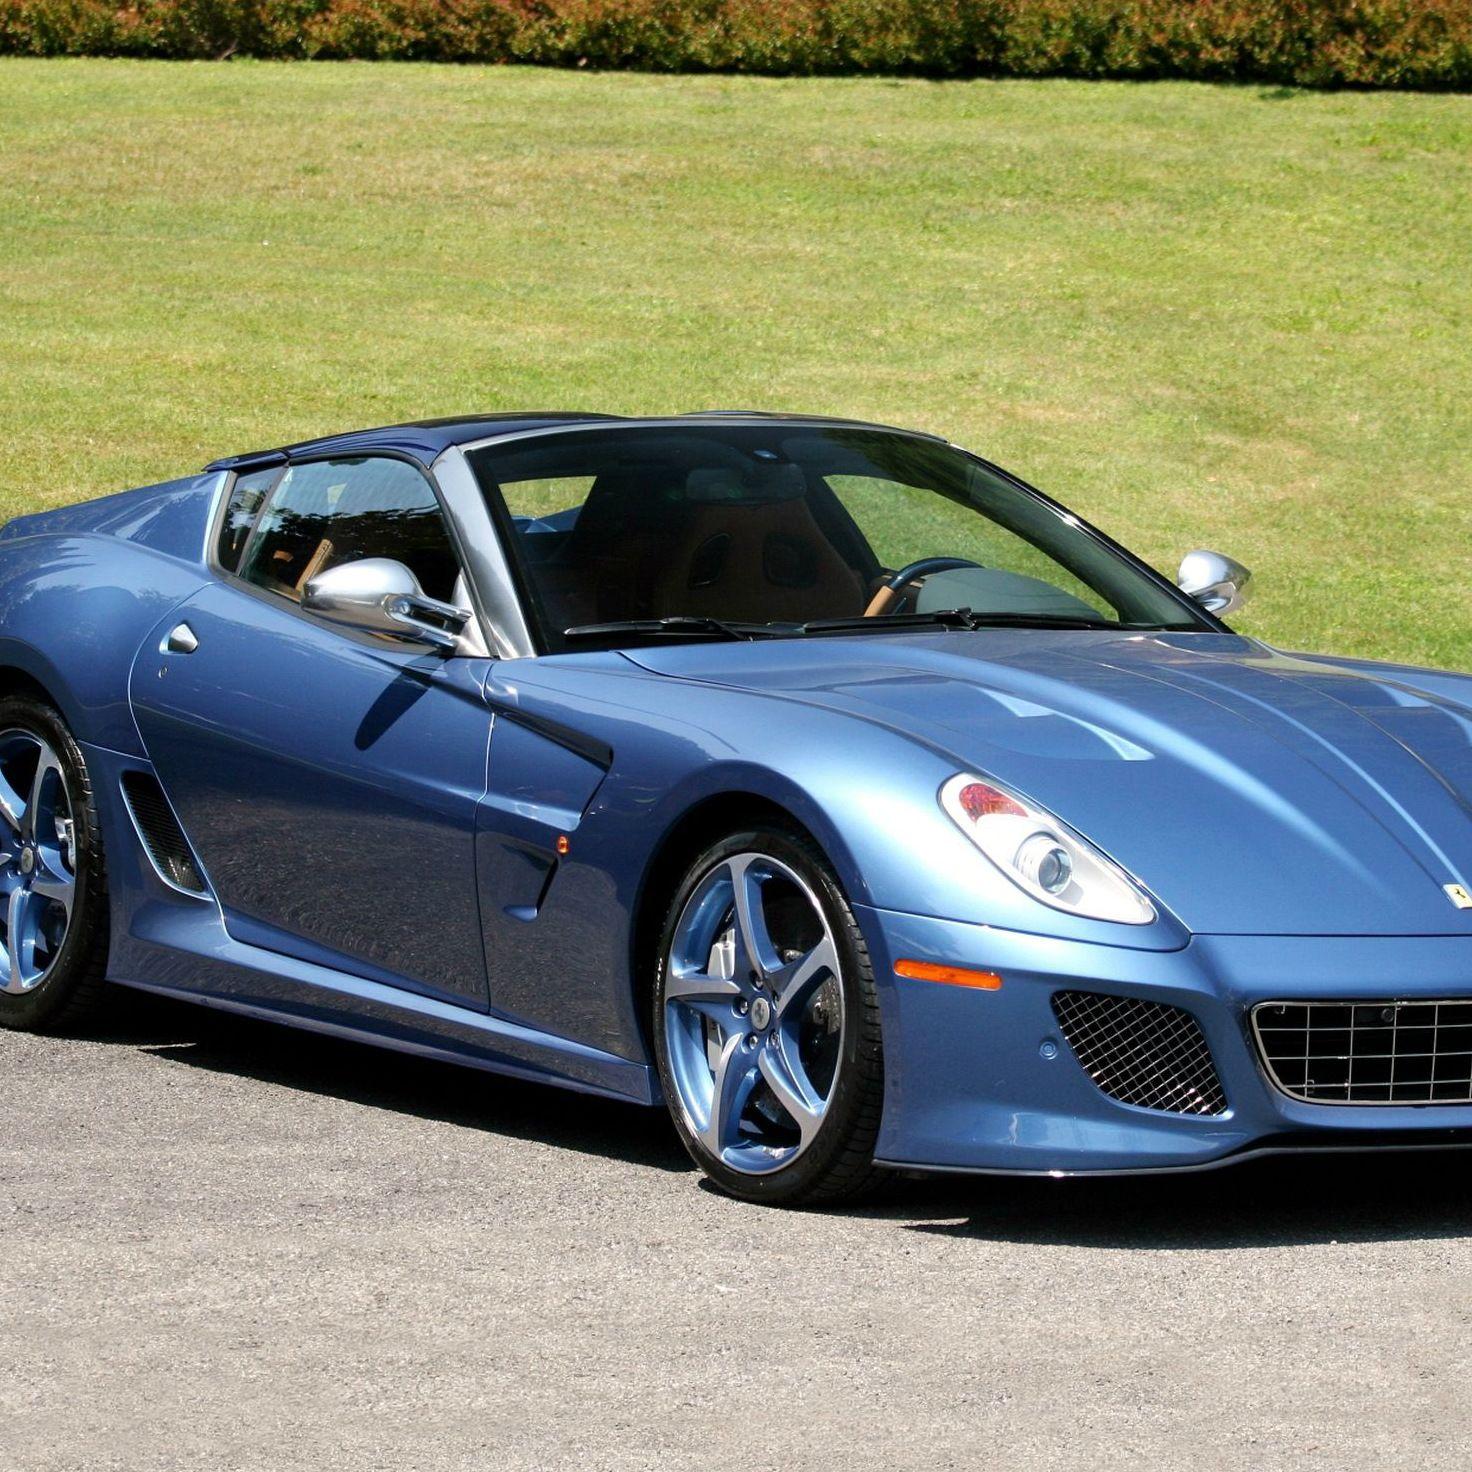 Ferrari Model List: Every Ferrari, Every Year (com imagens)